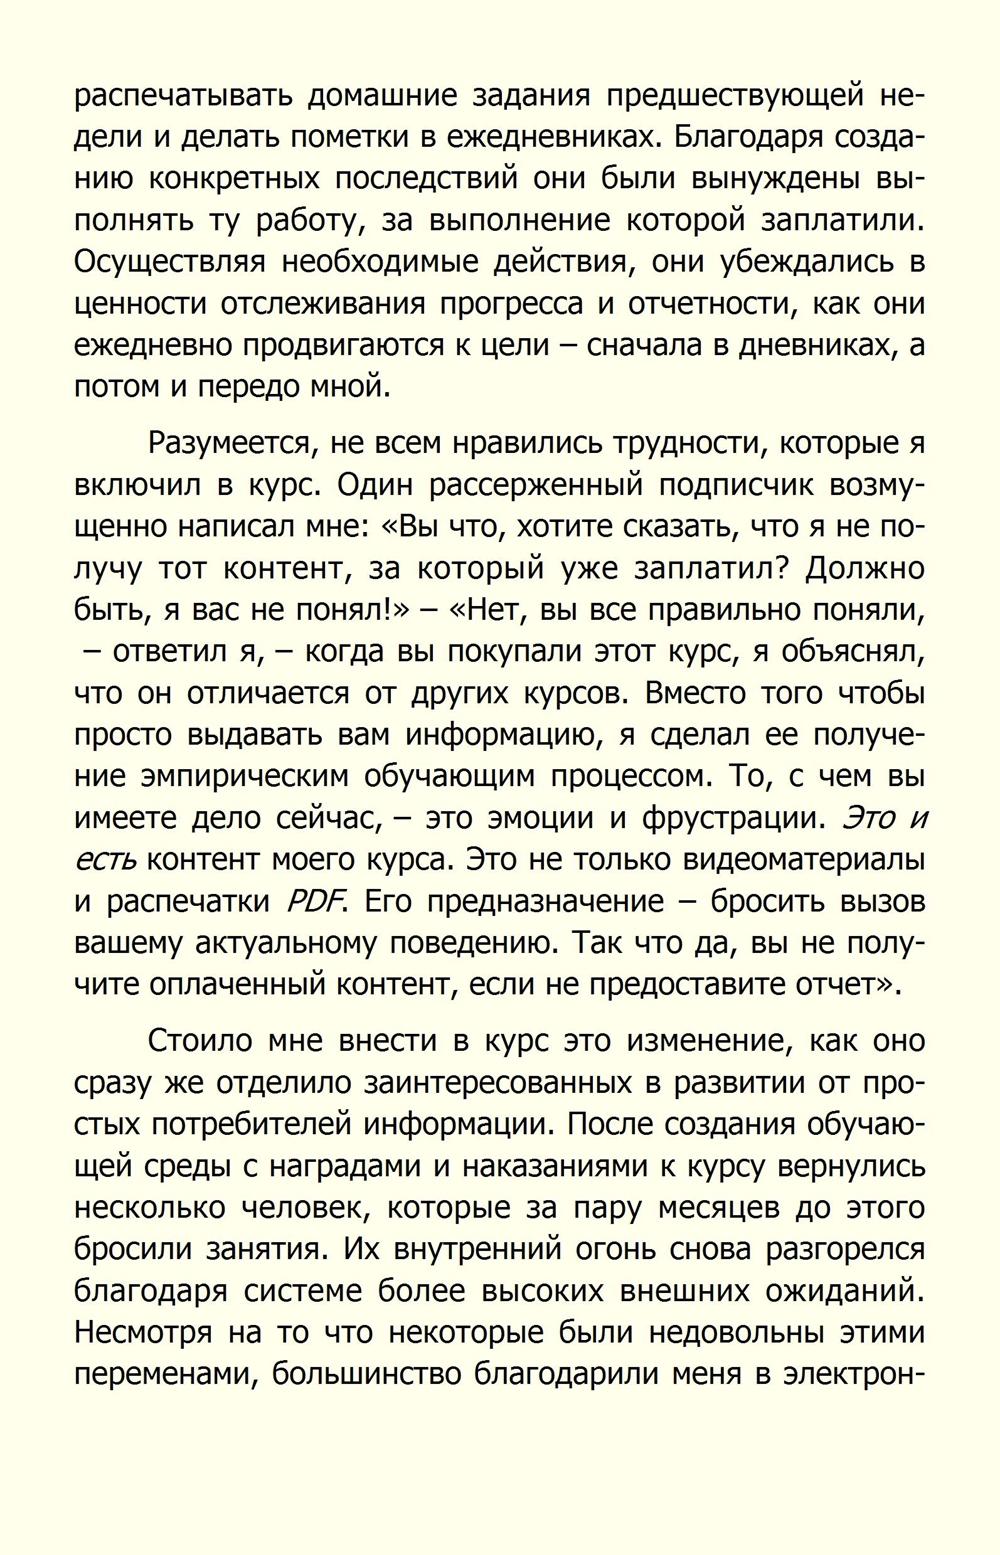 http://ipic.su/img/img7/fs/Silavolinerabotaet_134.1579720182.jpg